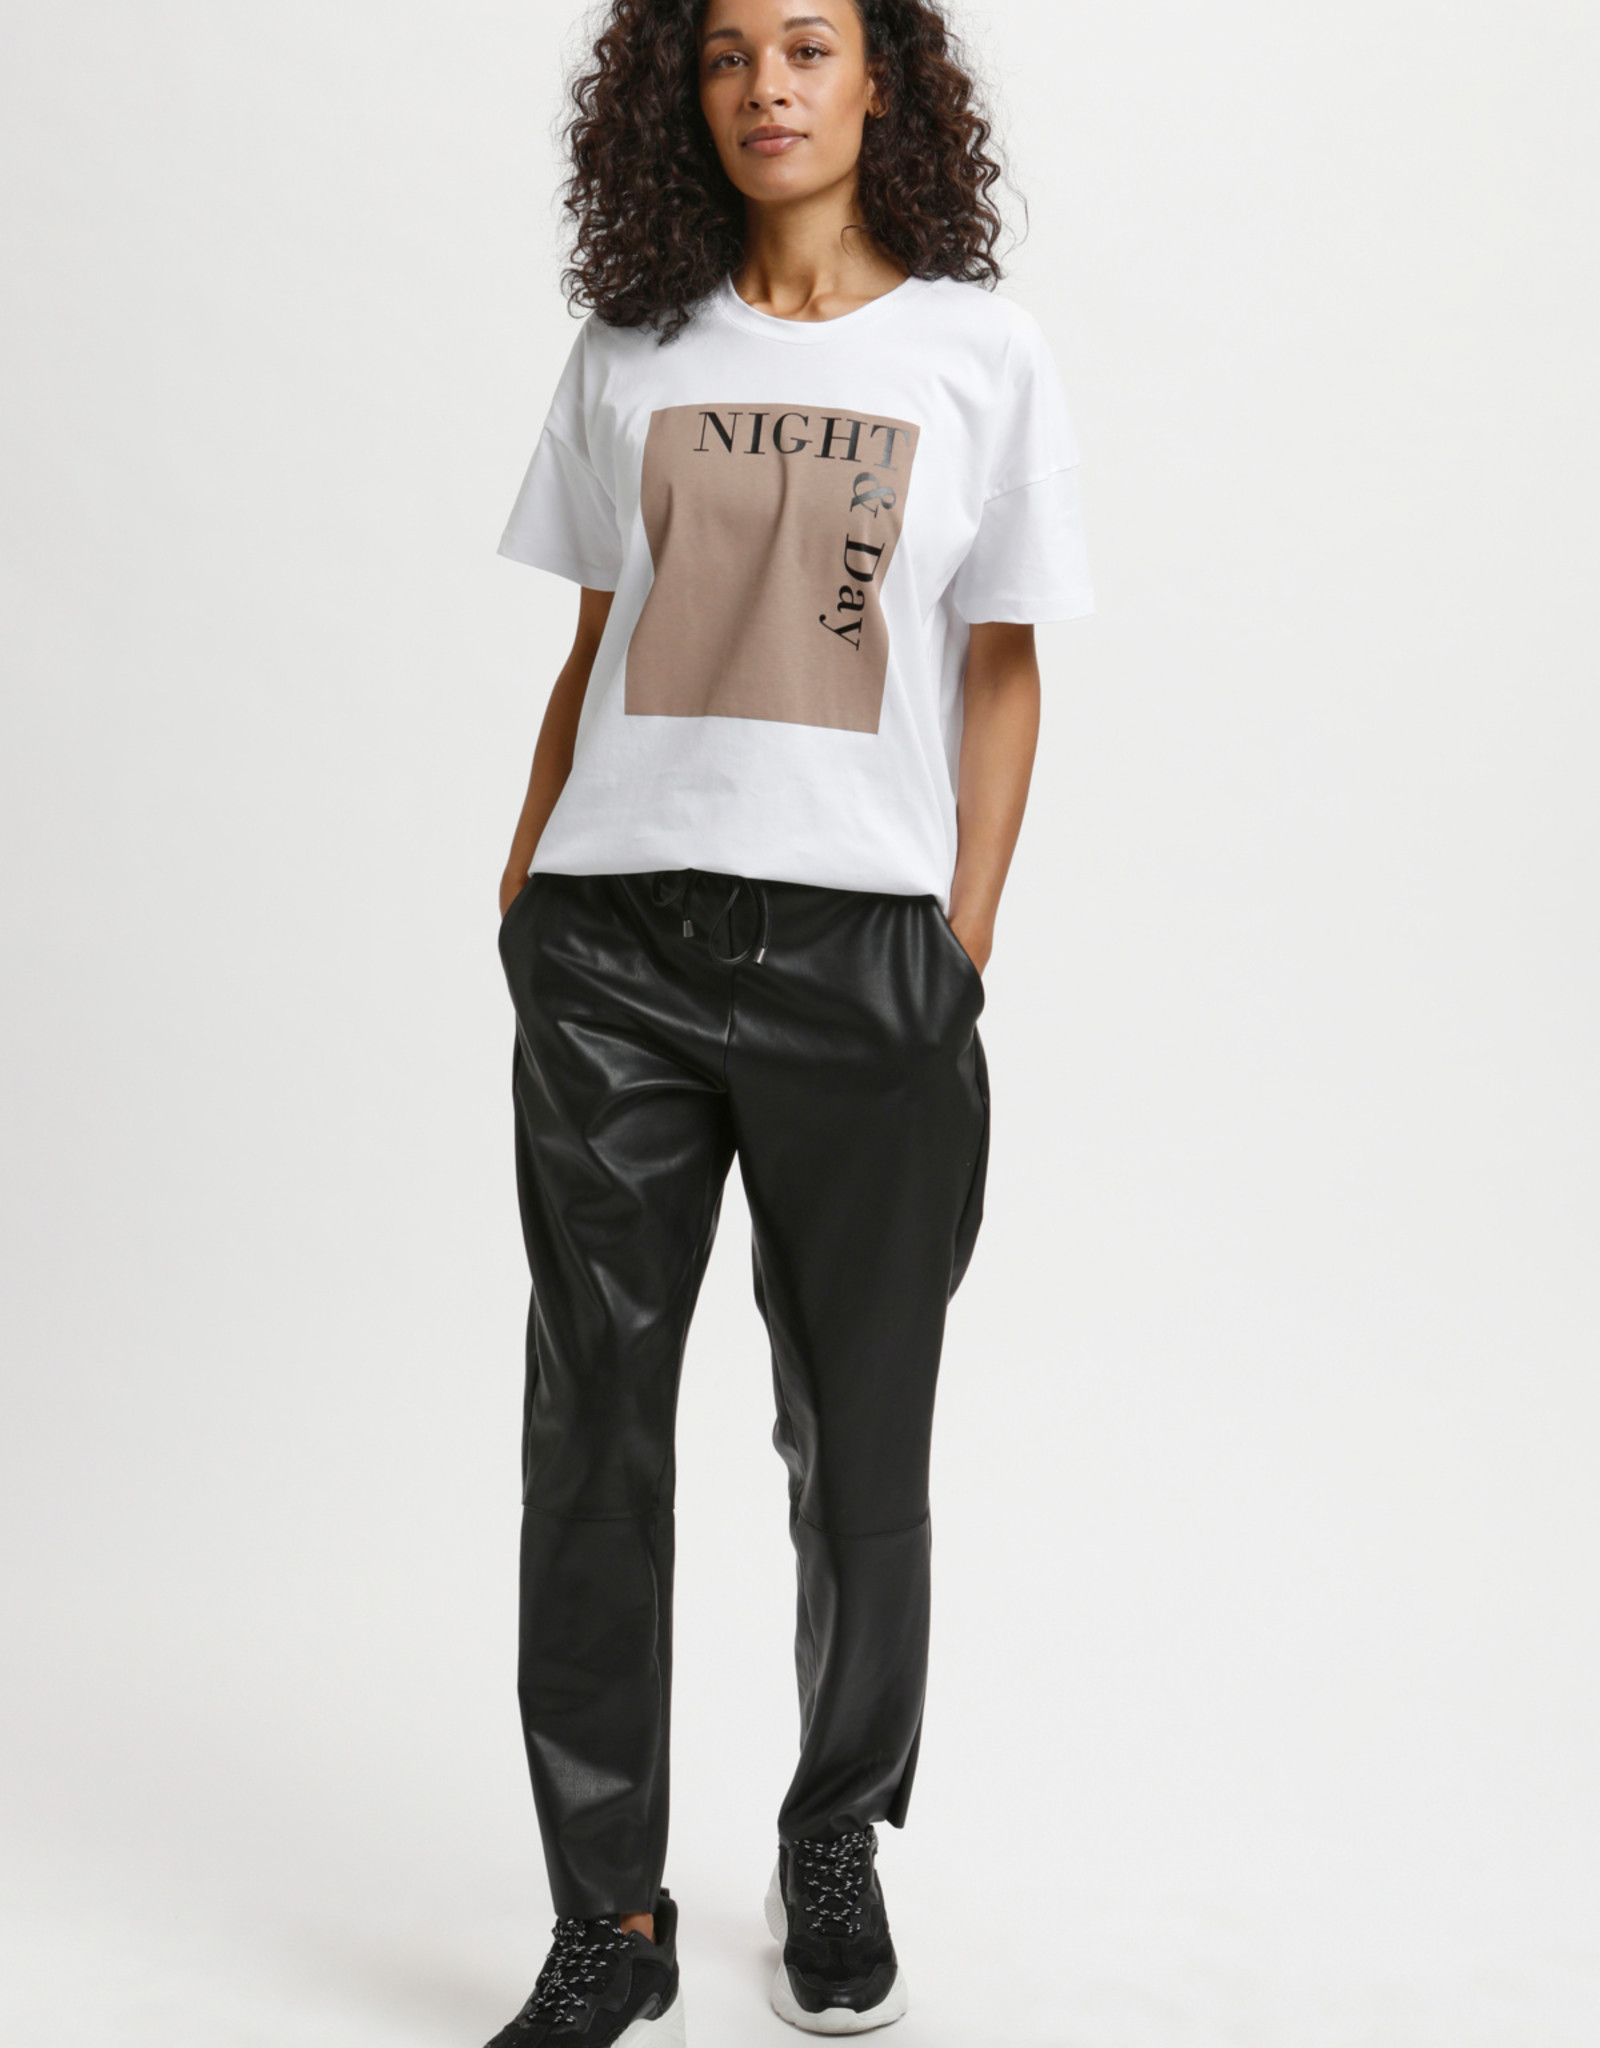 Kaffé Kaffé - KAlera T-shirt